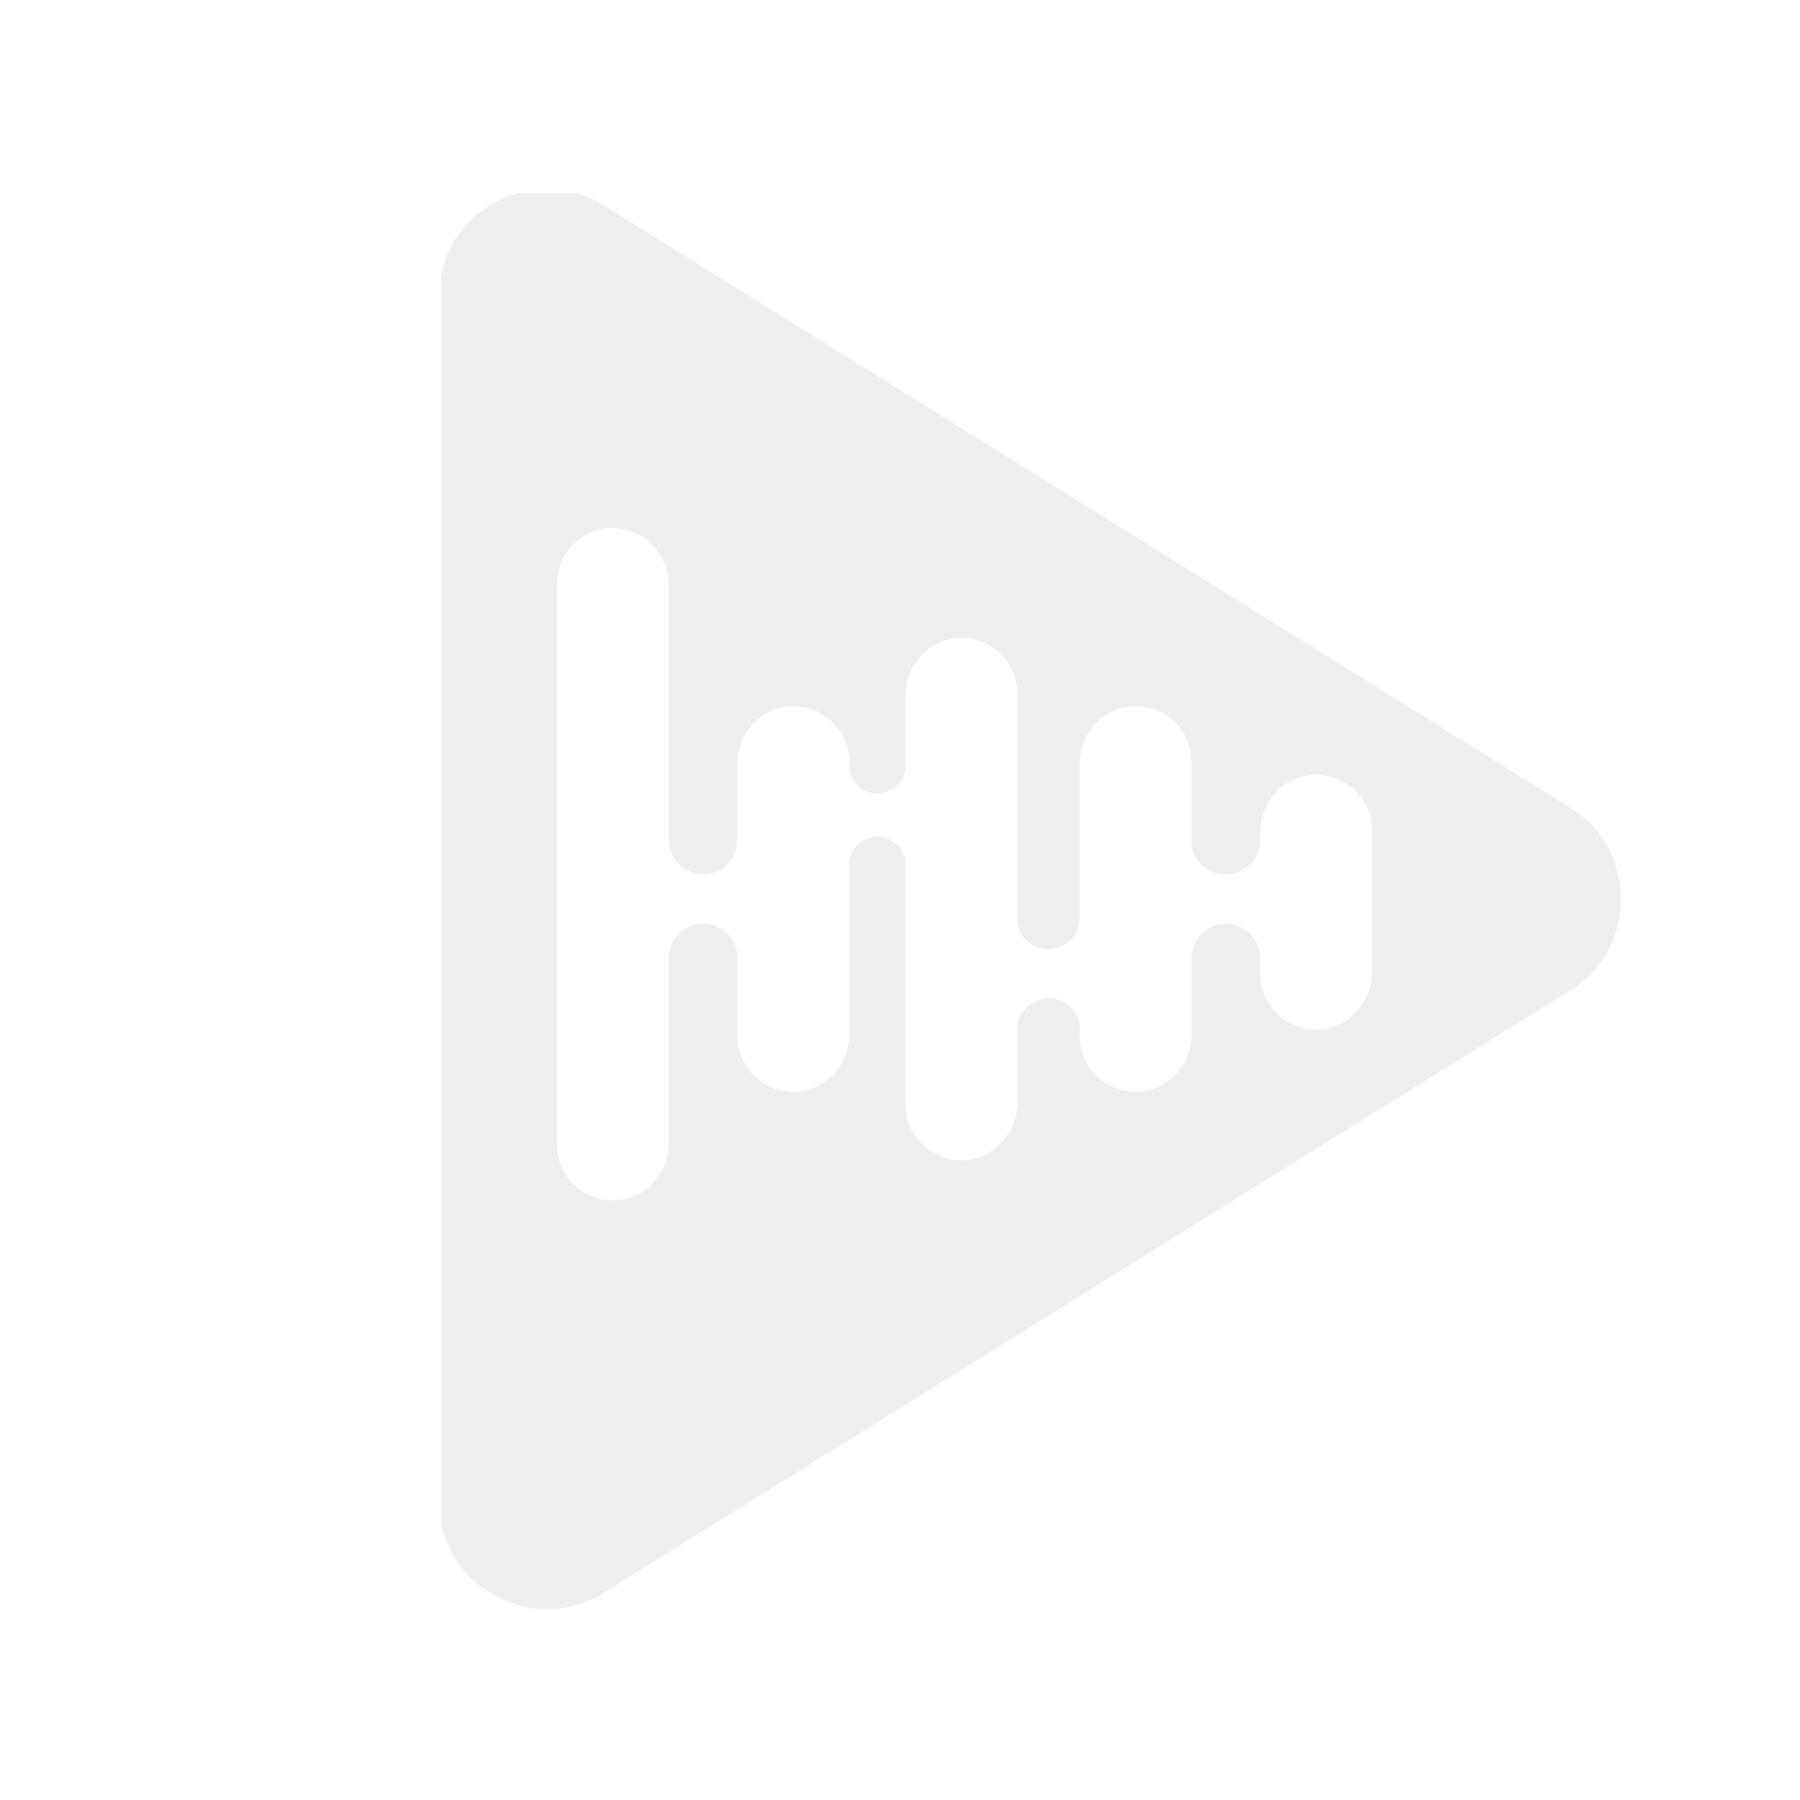 Grandview 148636 - Lerret Cyber, 16:9, 266x150, Manuelt 120